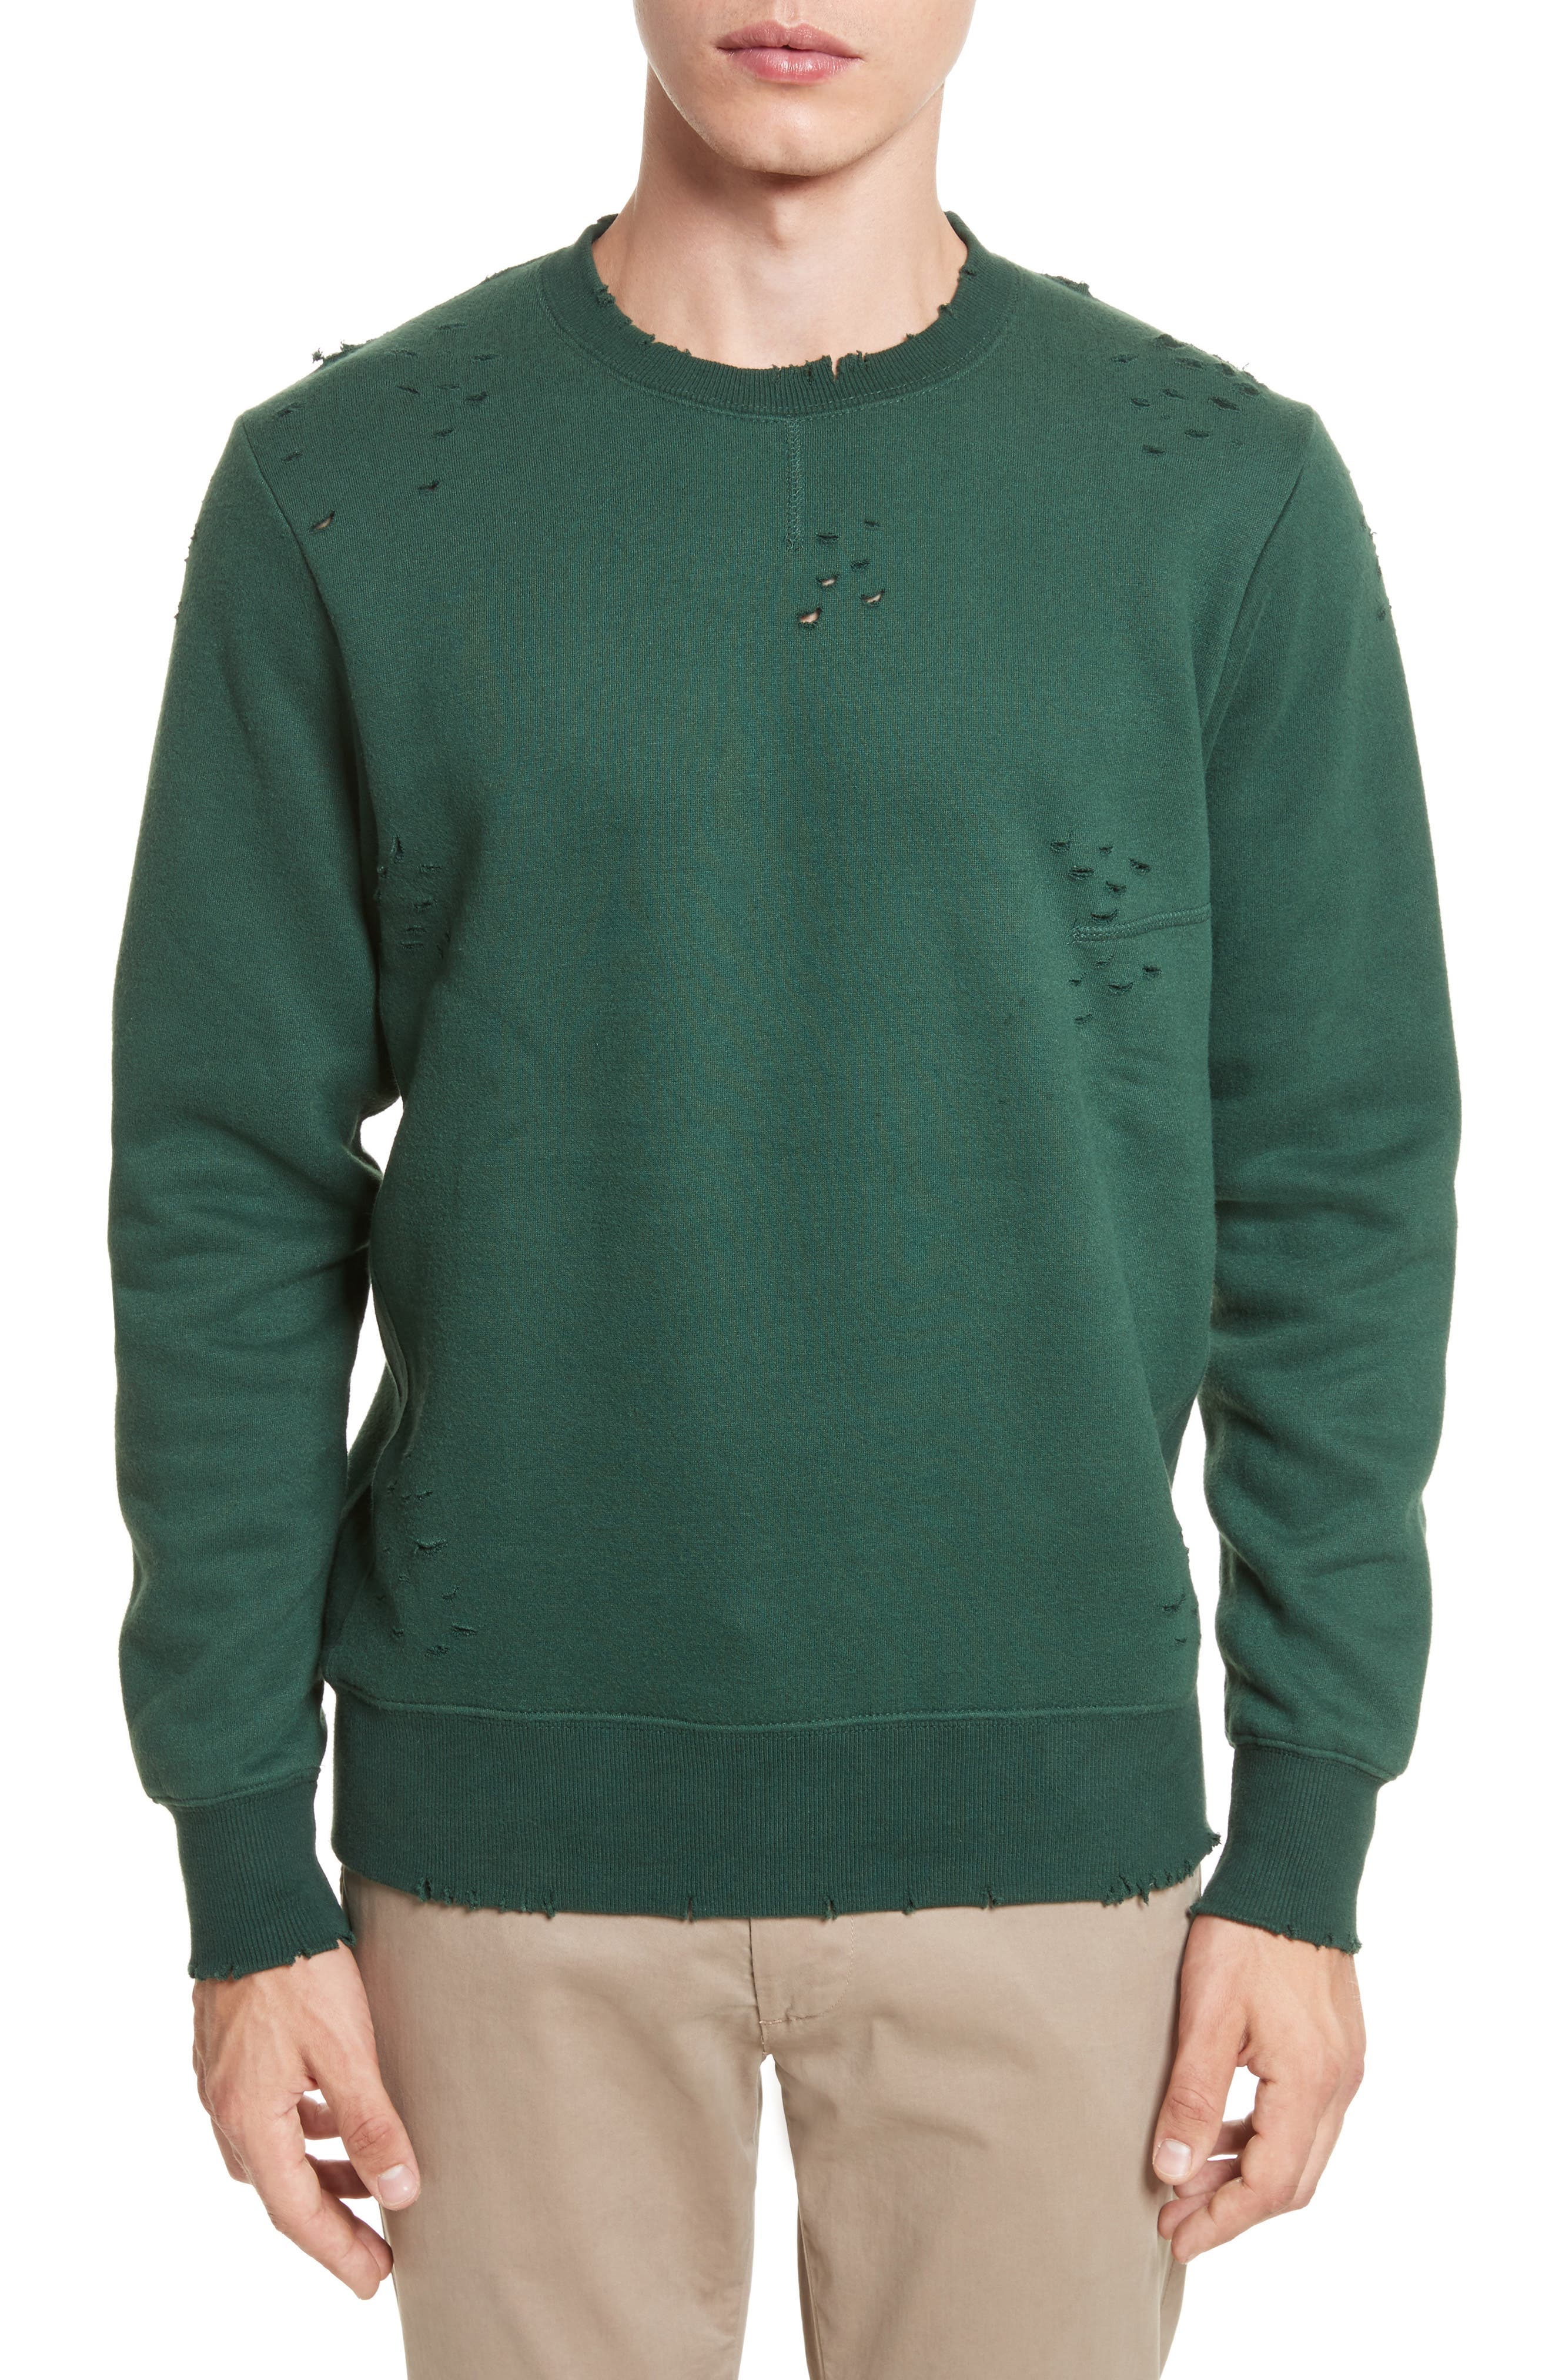 Main Image - OVADIA & SONS Crewneck Sweater